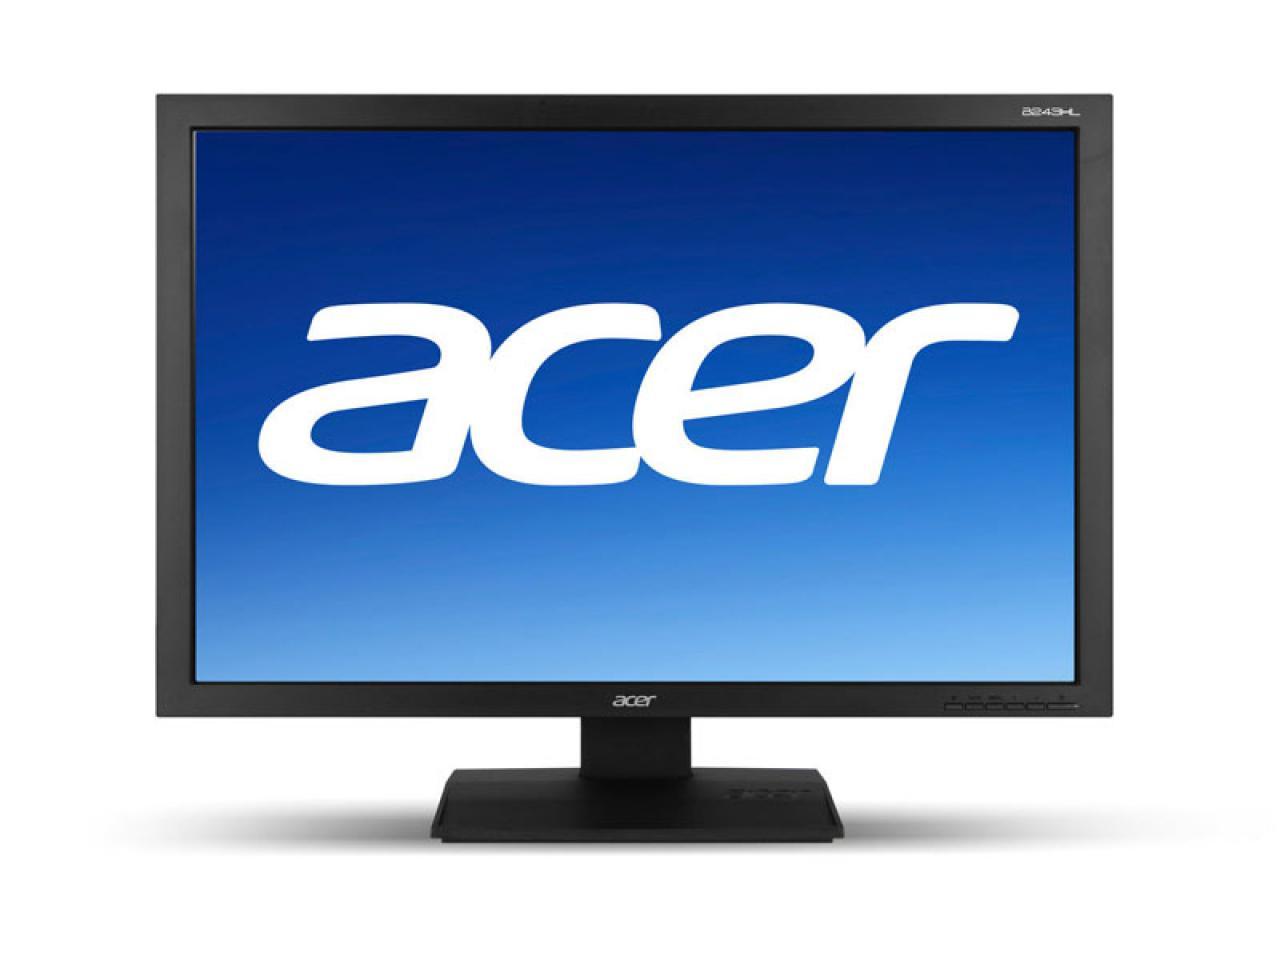 Acer B243HL   - shop.bb-net.de